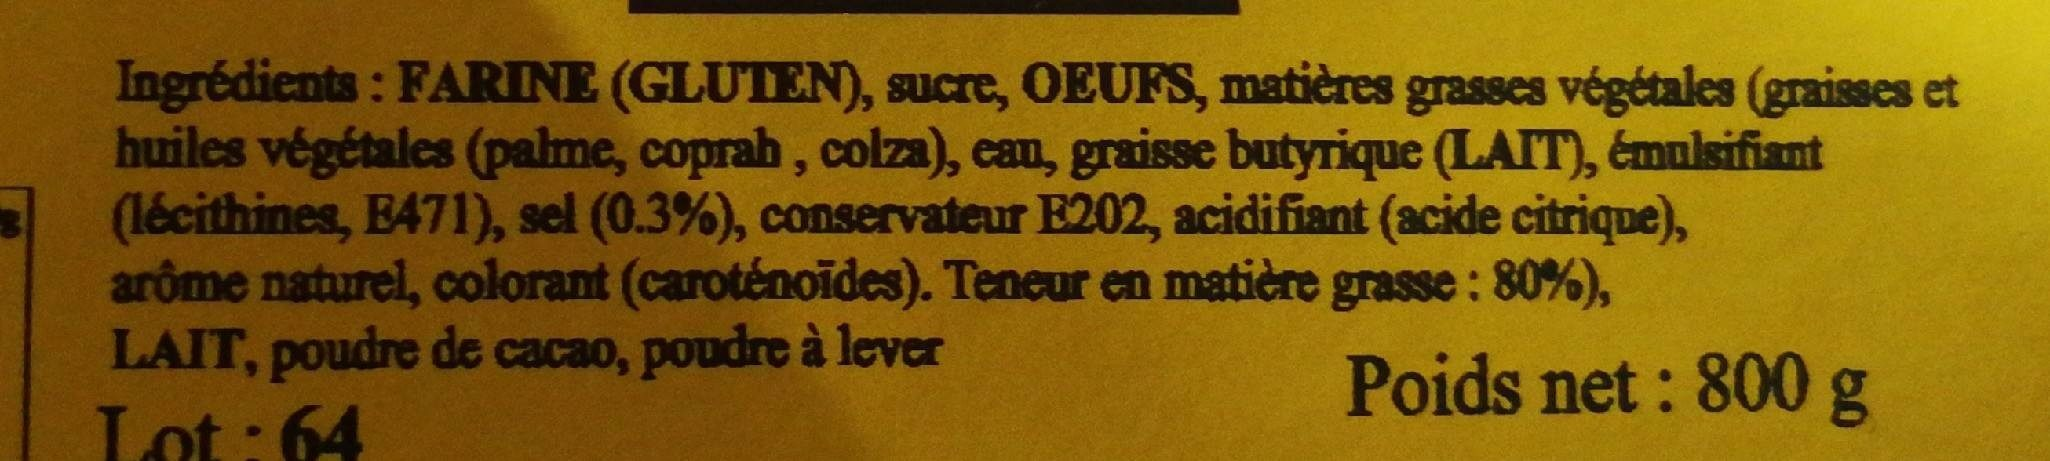 Marbré - Ingrediënten